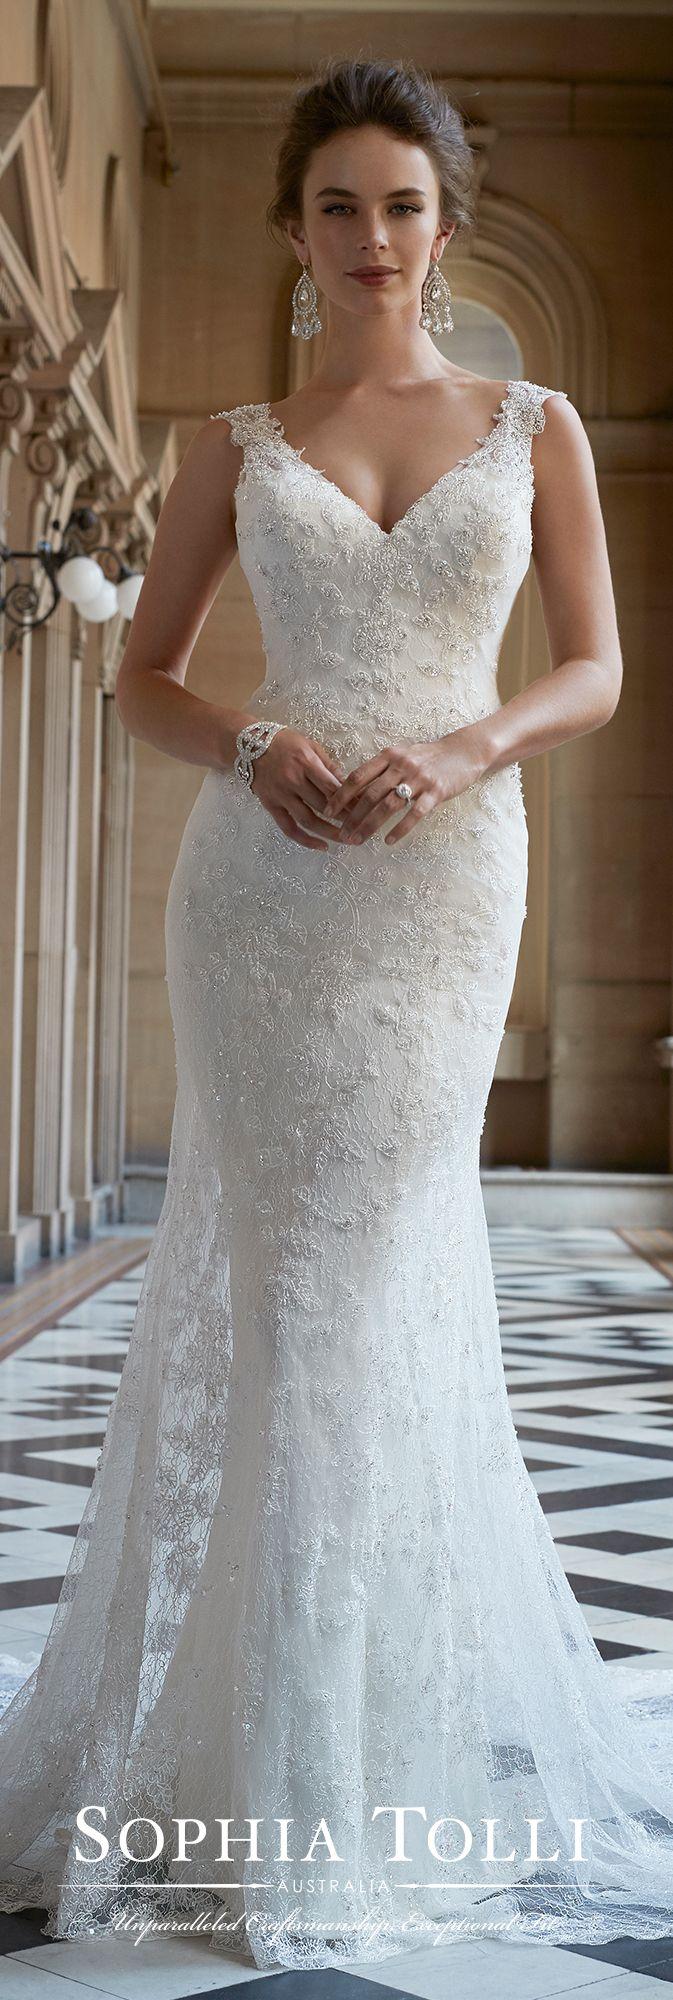 Sophia Tolli Y21762 Zaniah – Lace V-neck wedding dress with illusion back. Sleev…